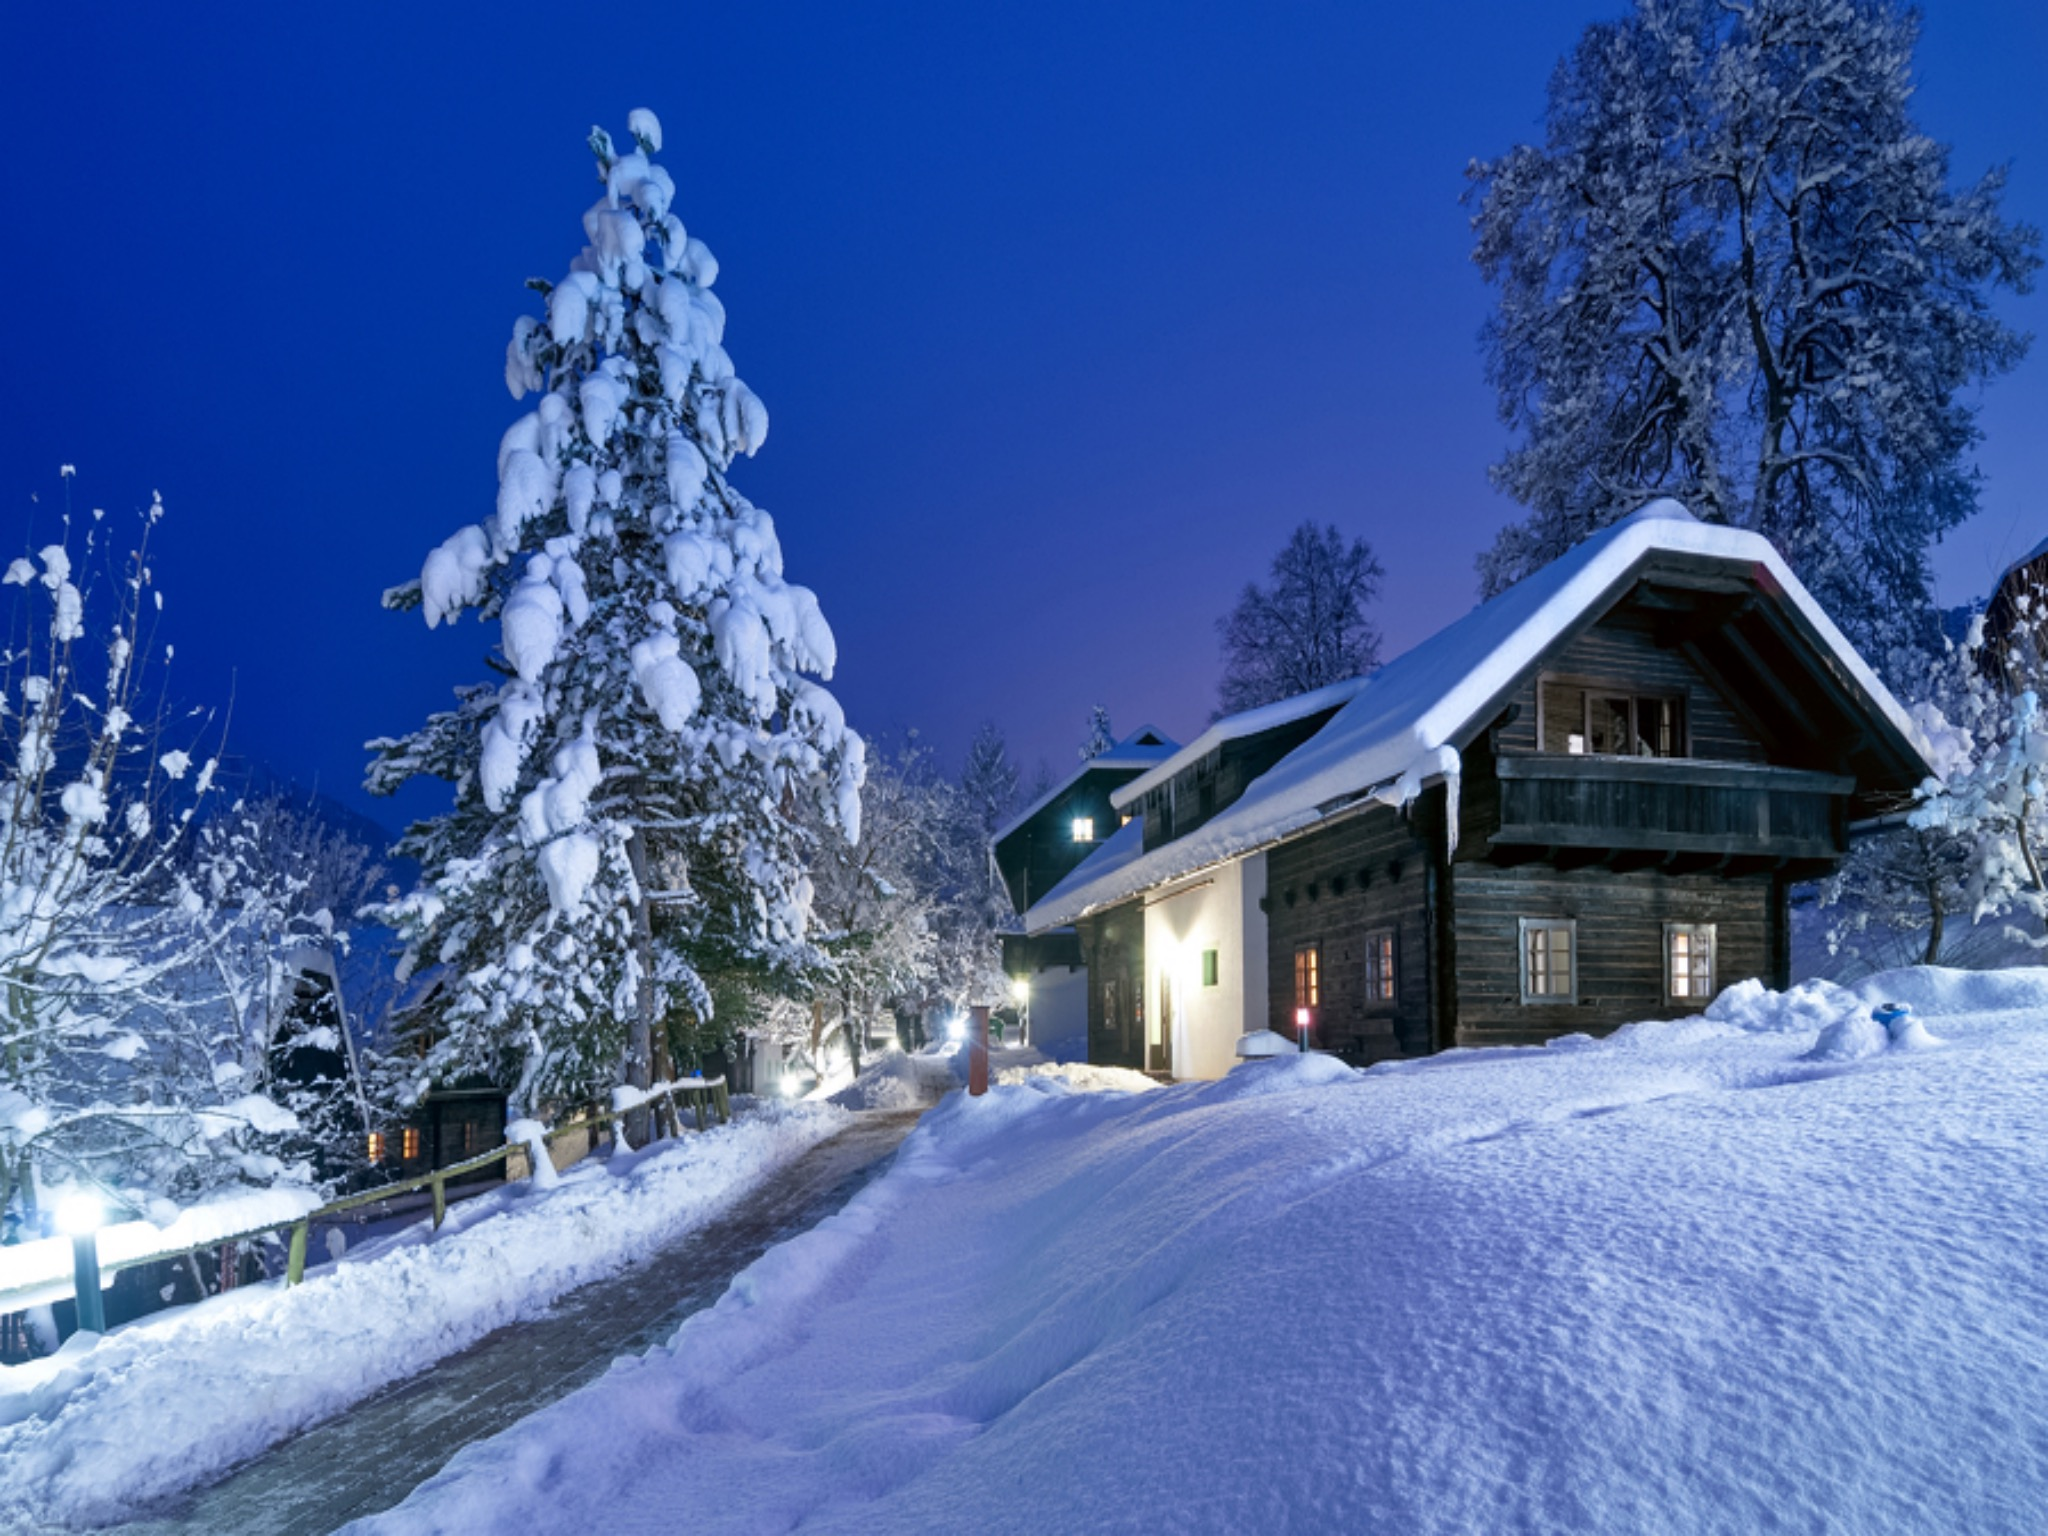 Skiurlaub im Hotel Naturel. Foto: Naturel Hotels & Resorts